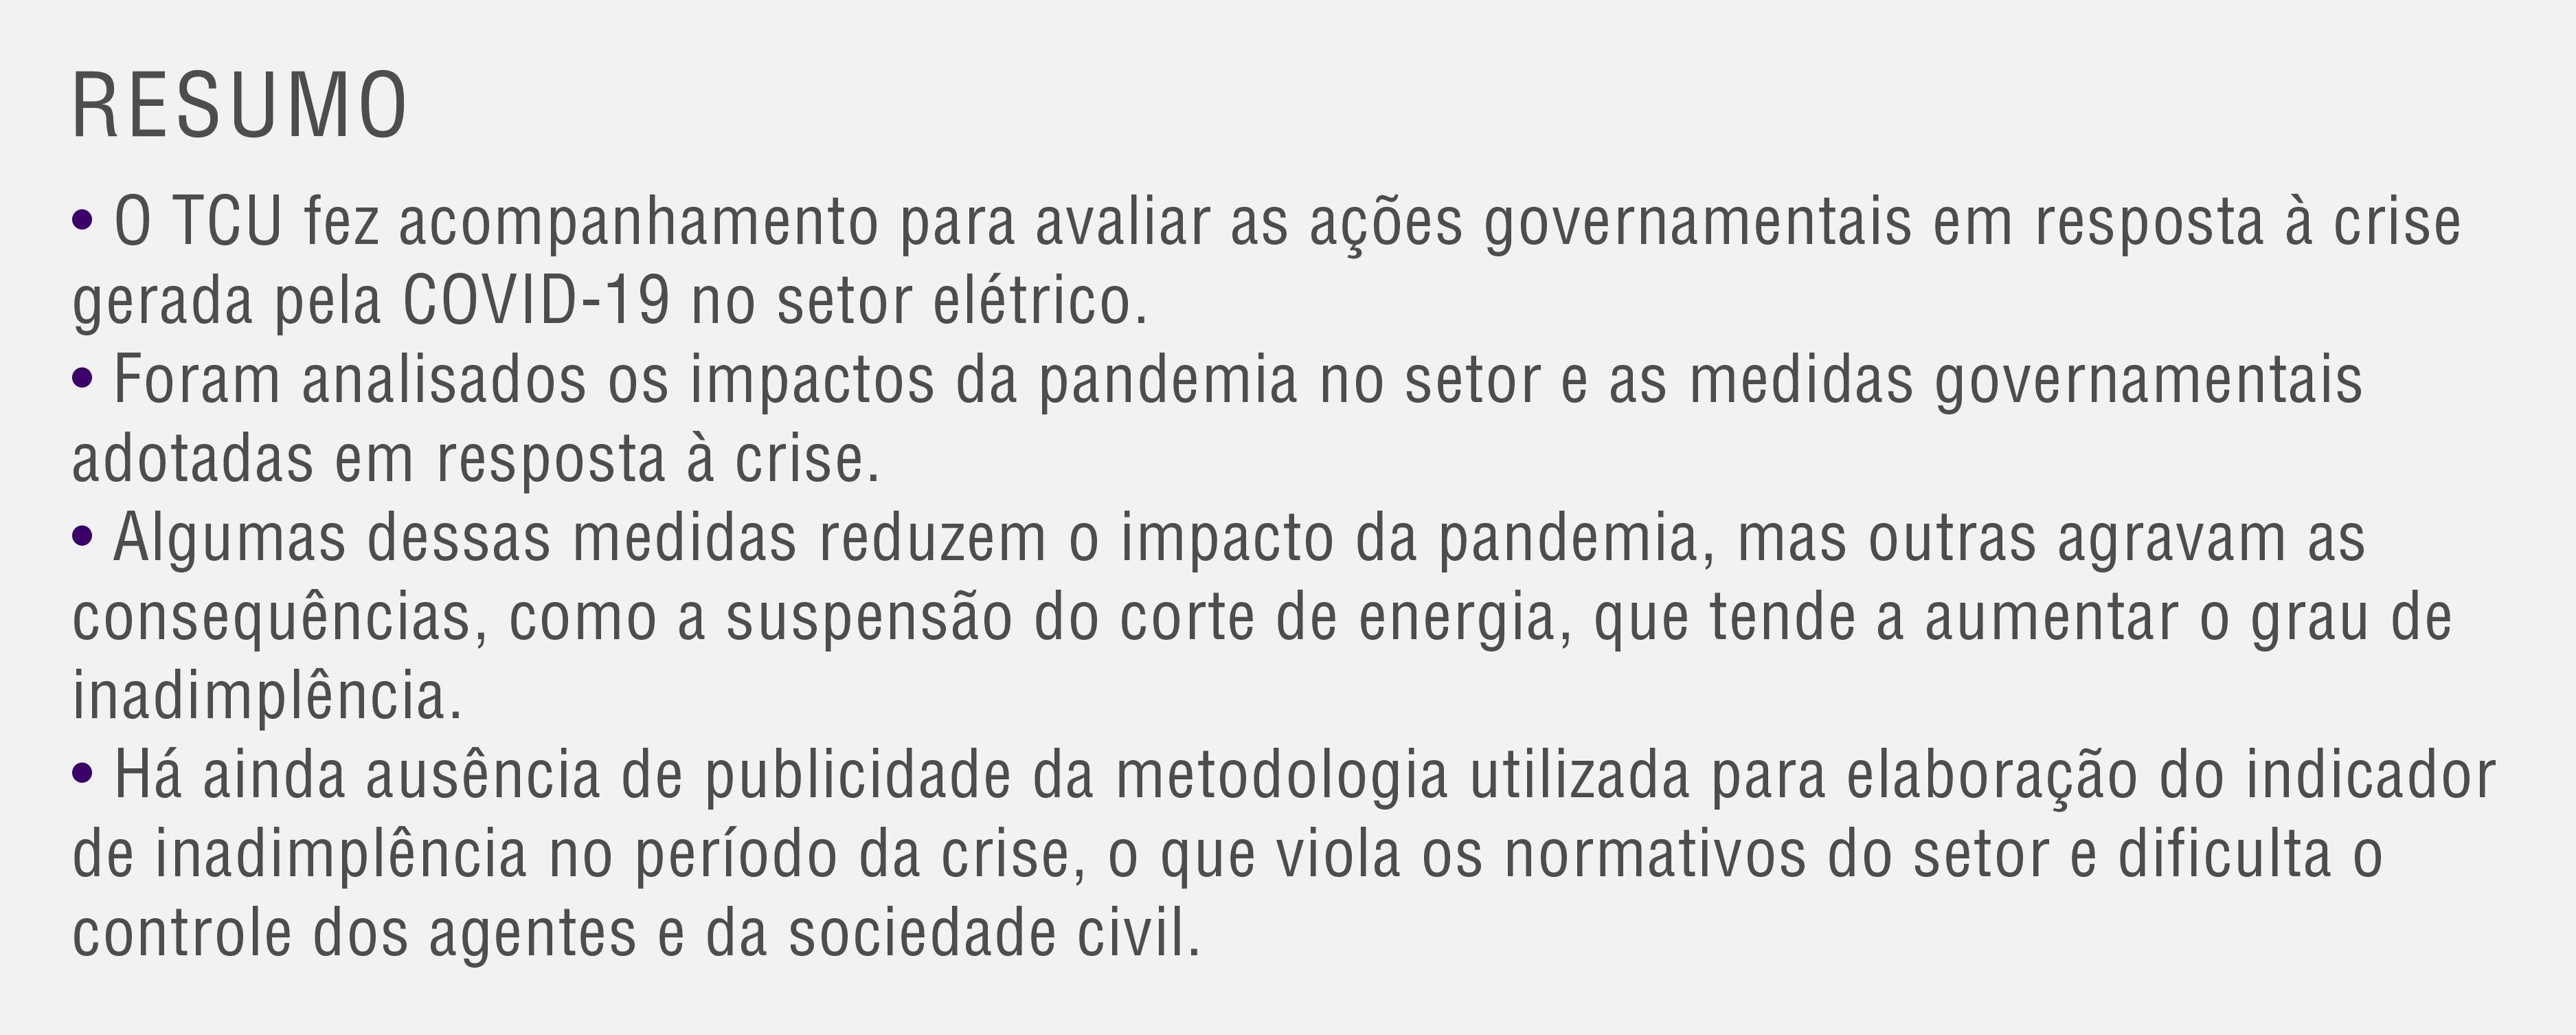 Quadro_resumo_padrao_seinfraeletrica-01.jpg